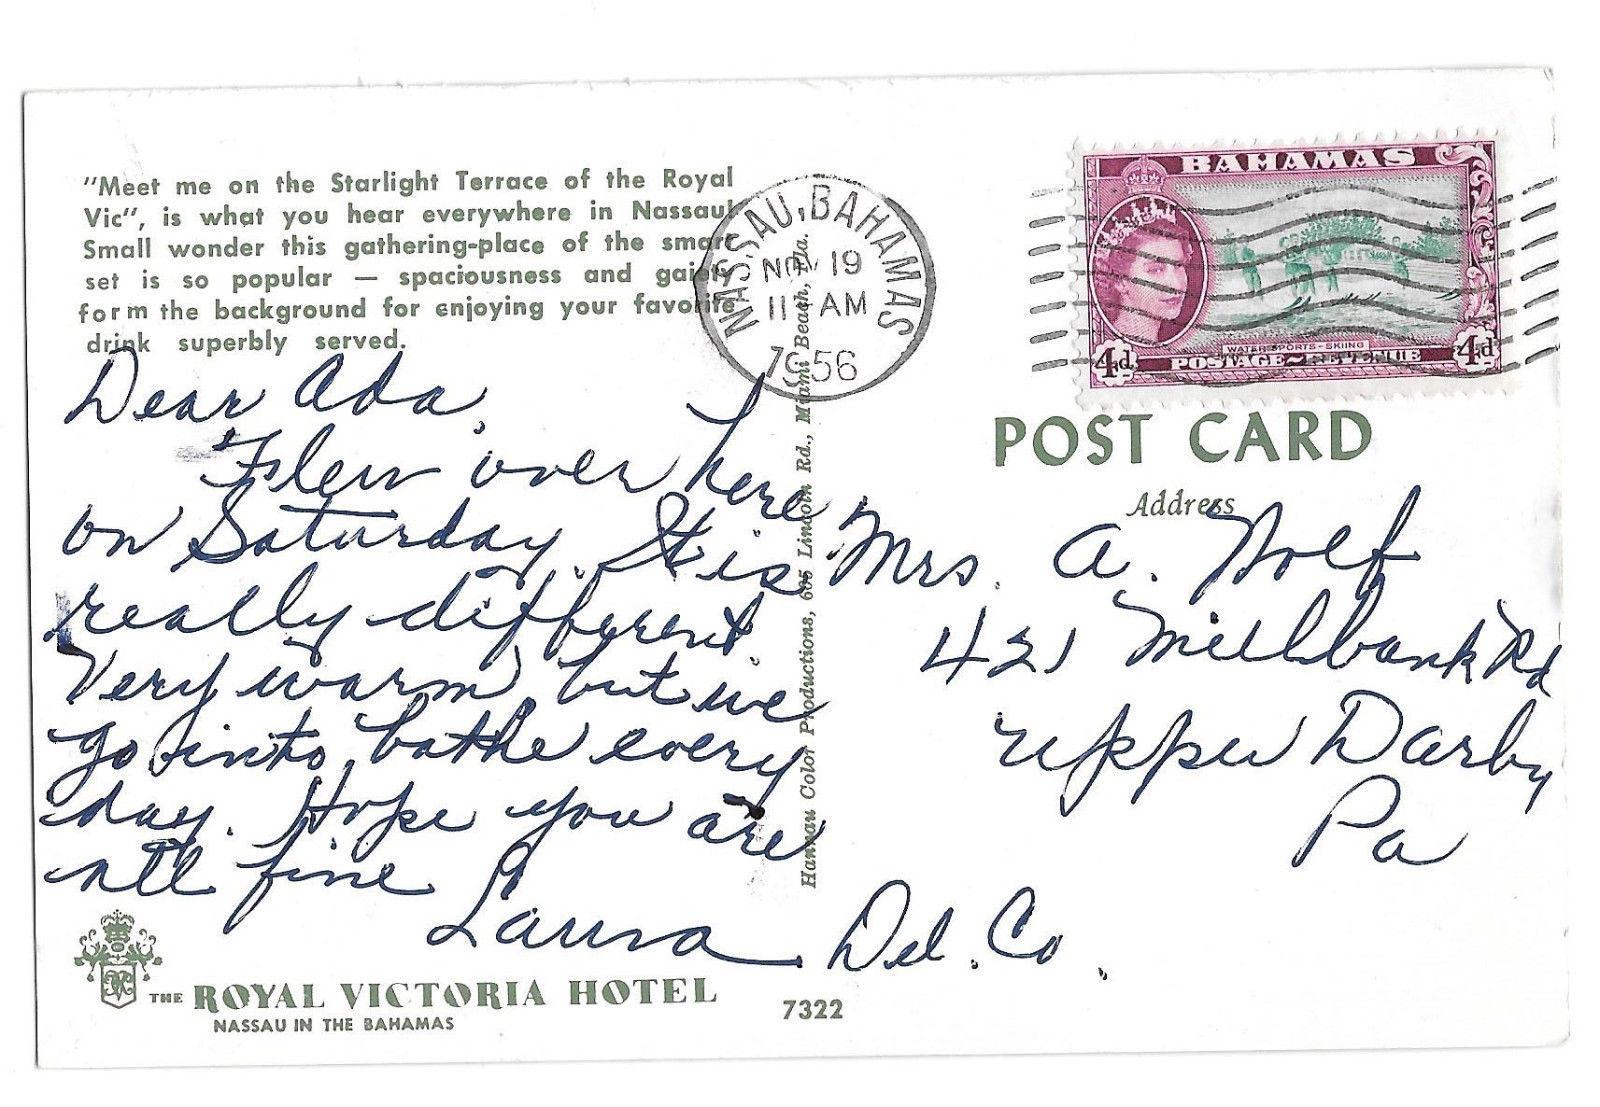 Bahamas Nassau Starlight Terrace Royal Victoria Hotel Vtg Postcard 1956 Stamp